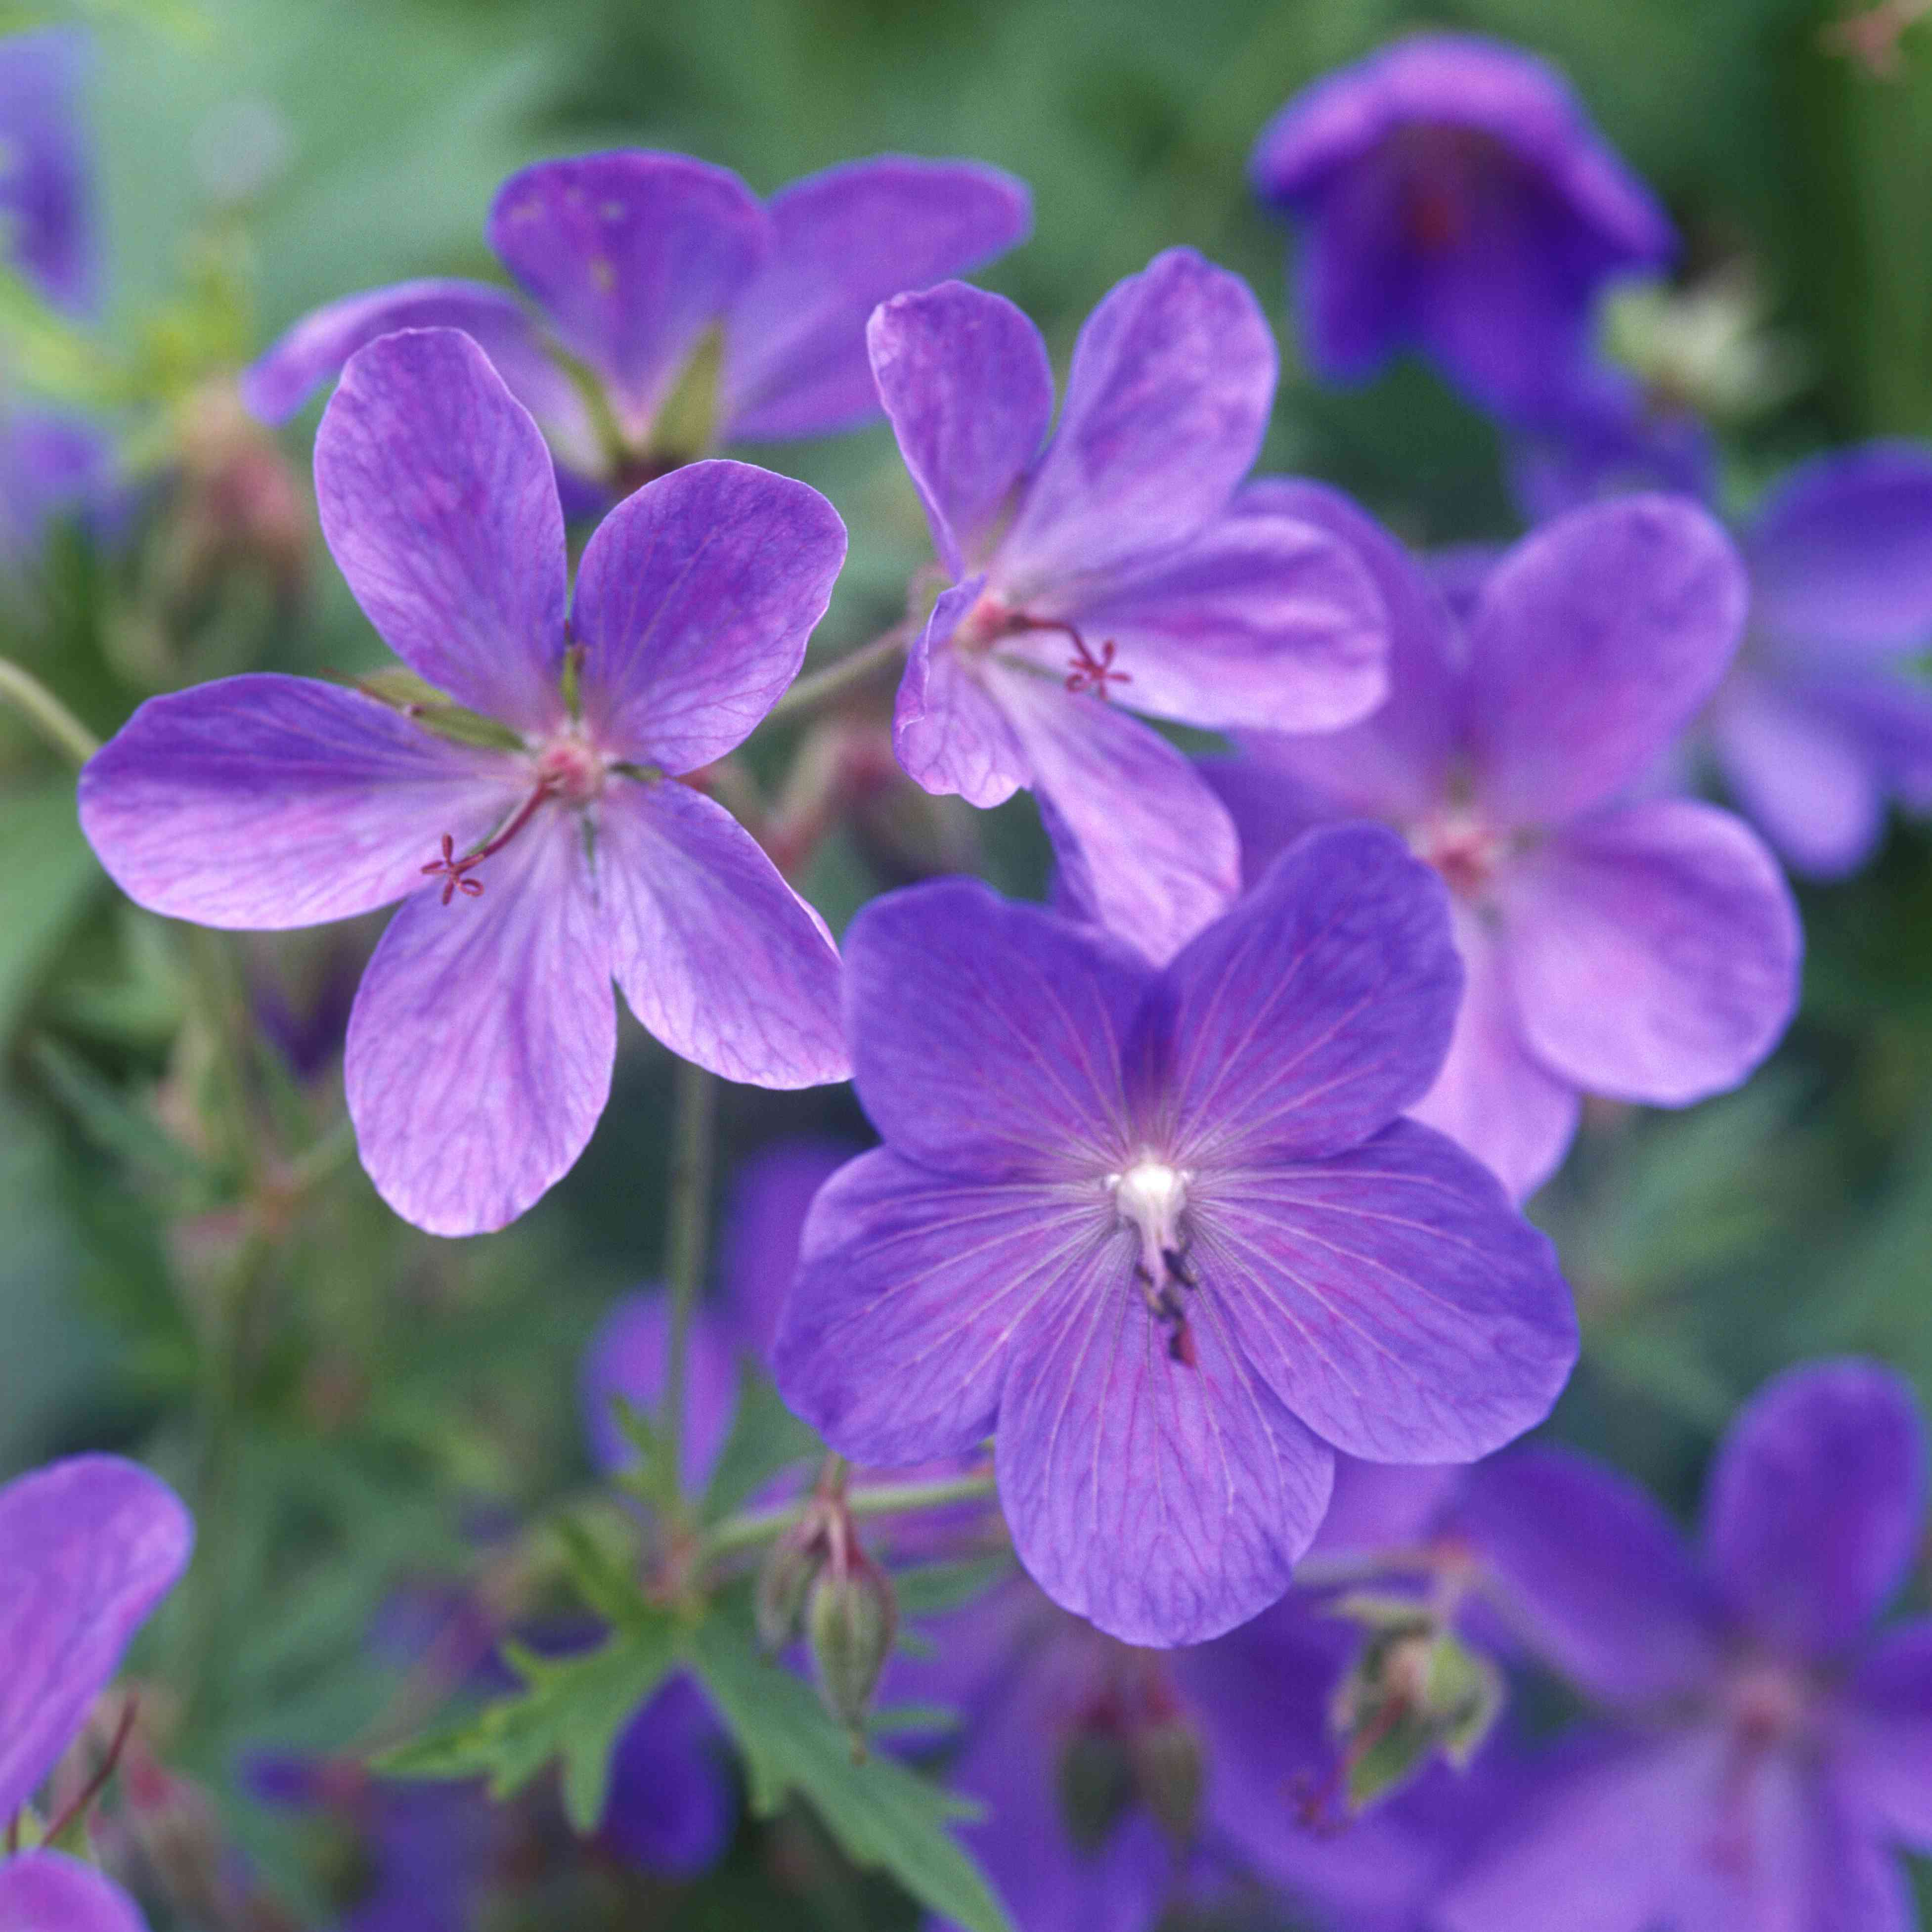 'Johnson's Blue' geraniums with purplish-blue flowers